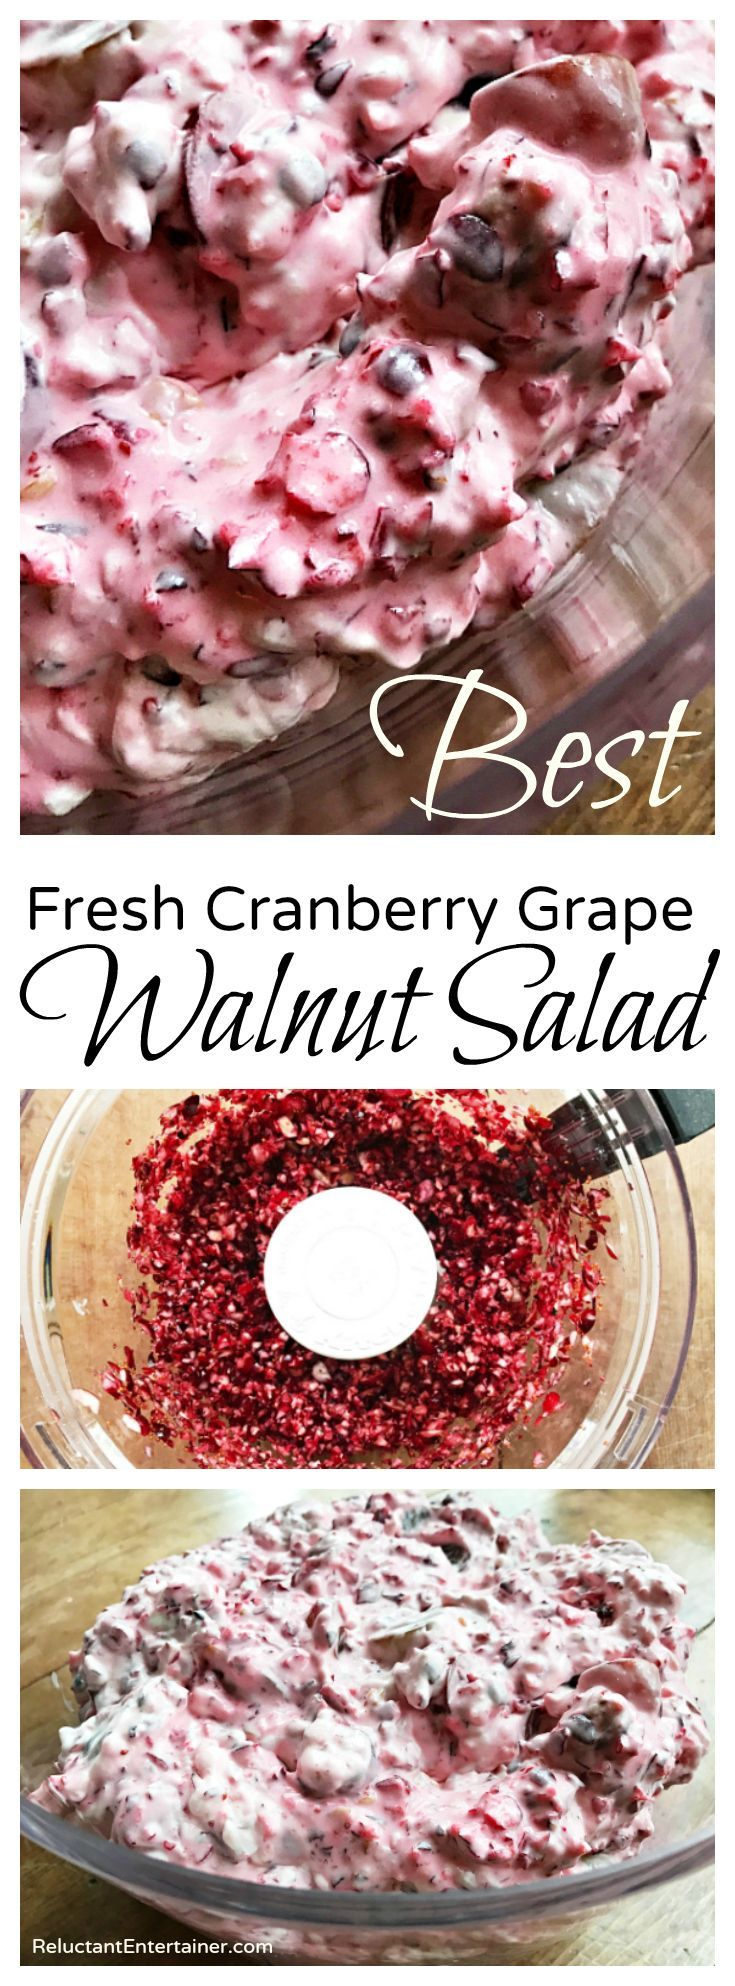 BEST Fresh Cranberry Grape Walnut Salad